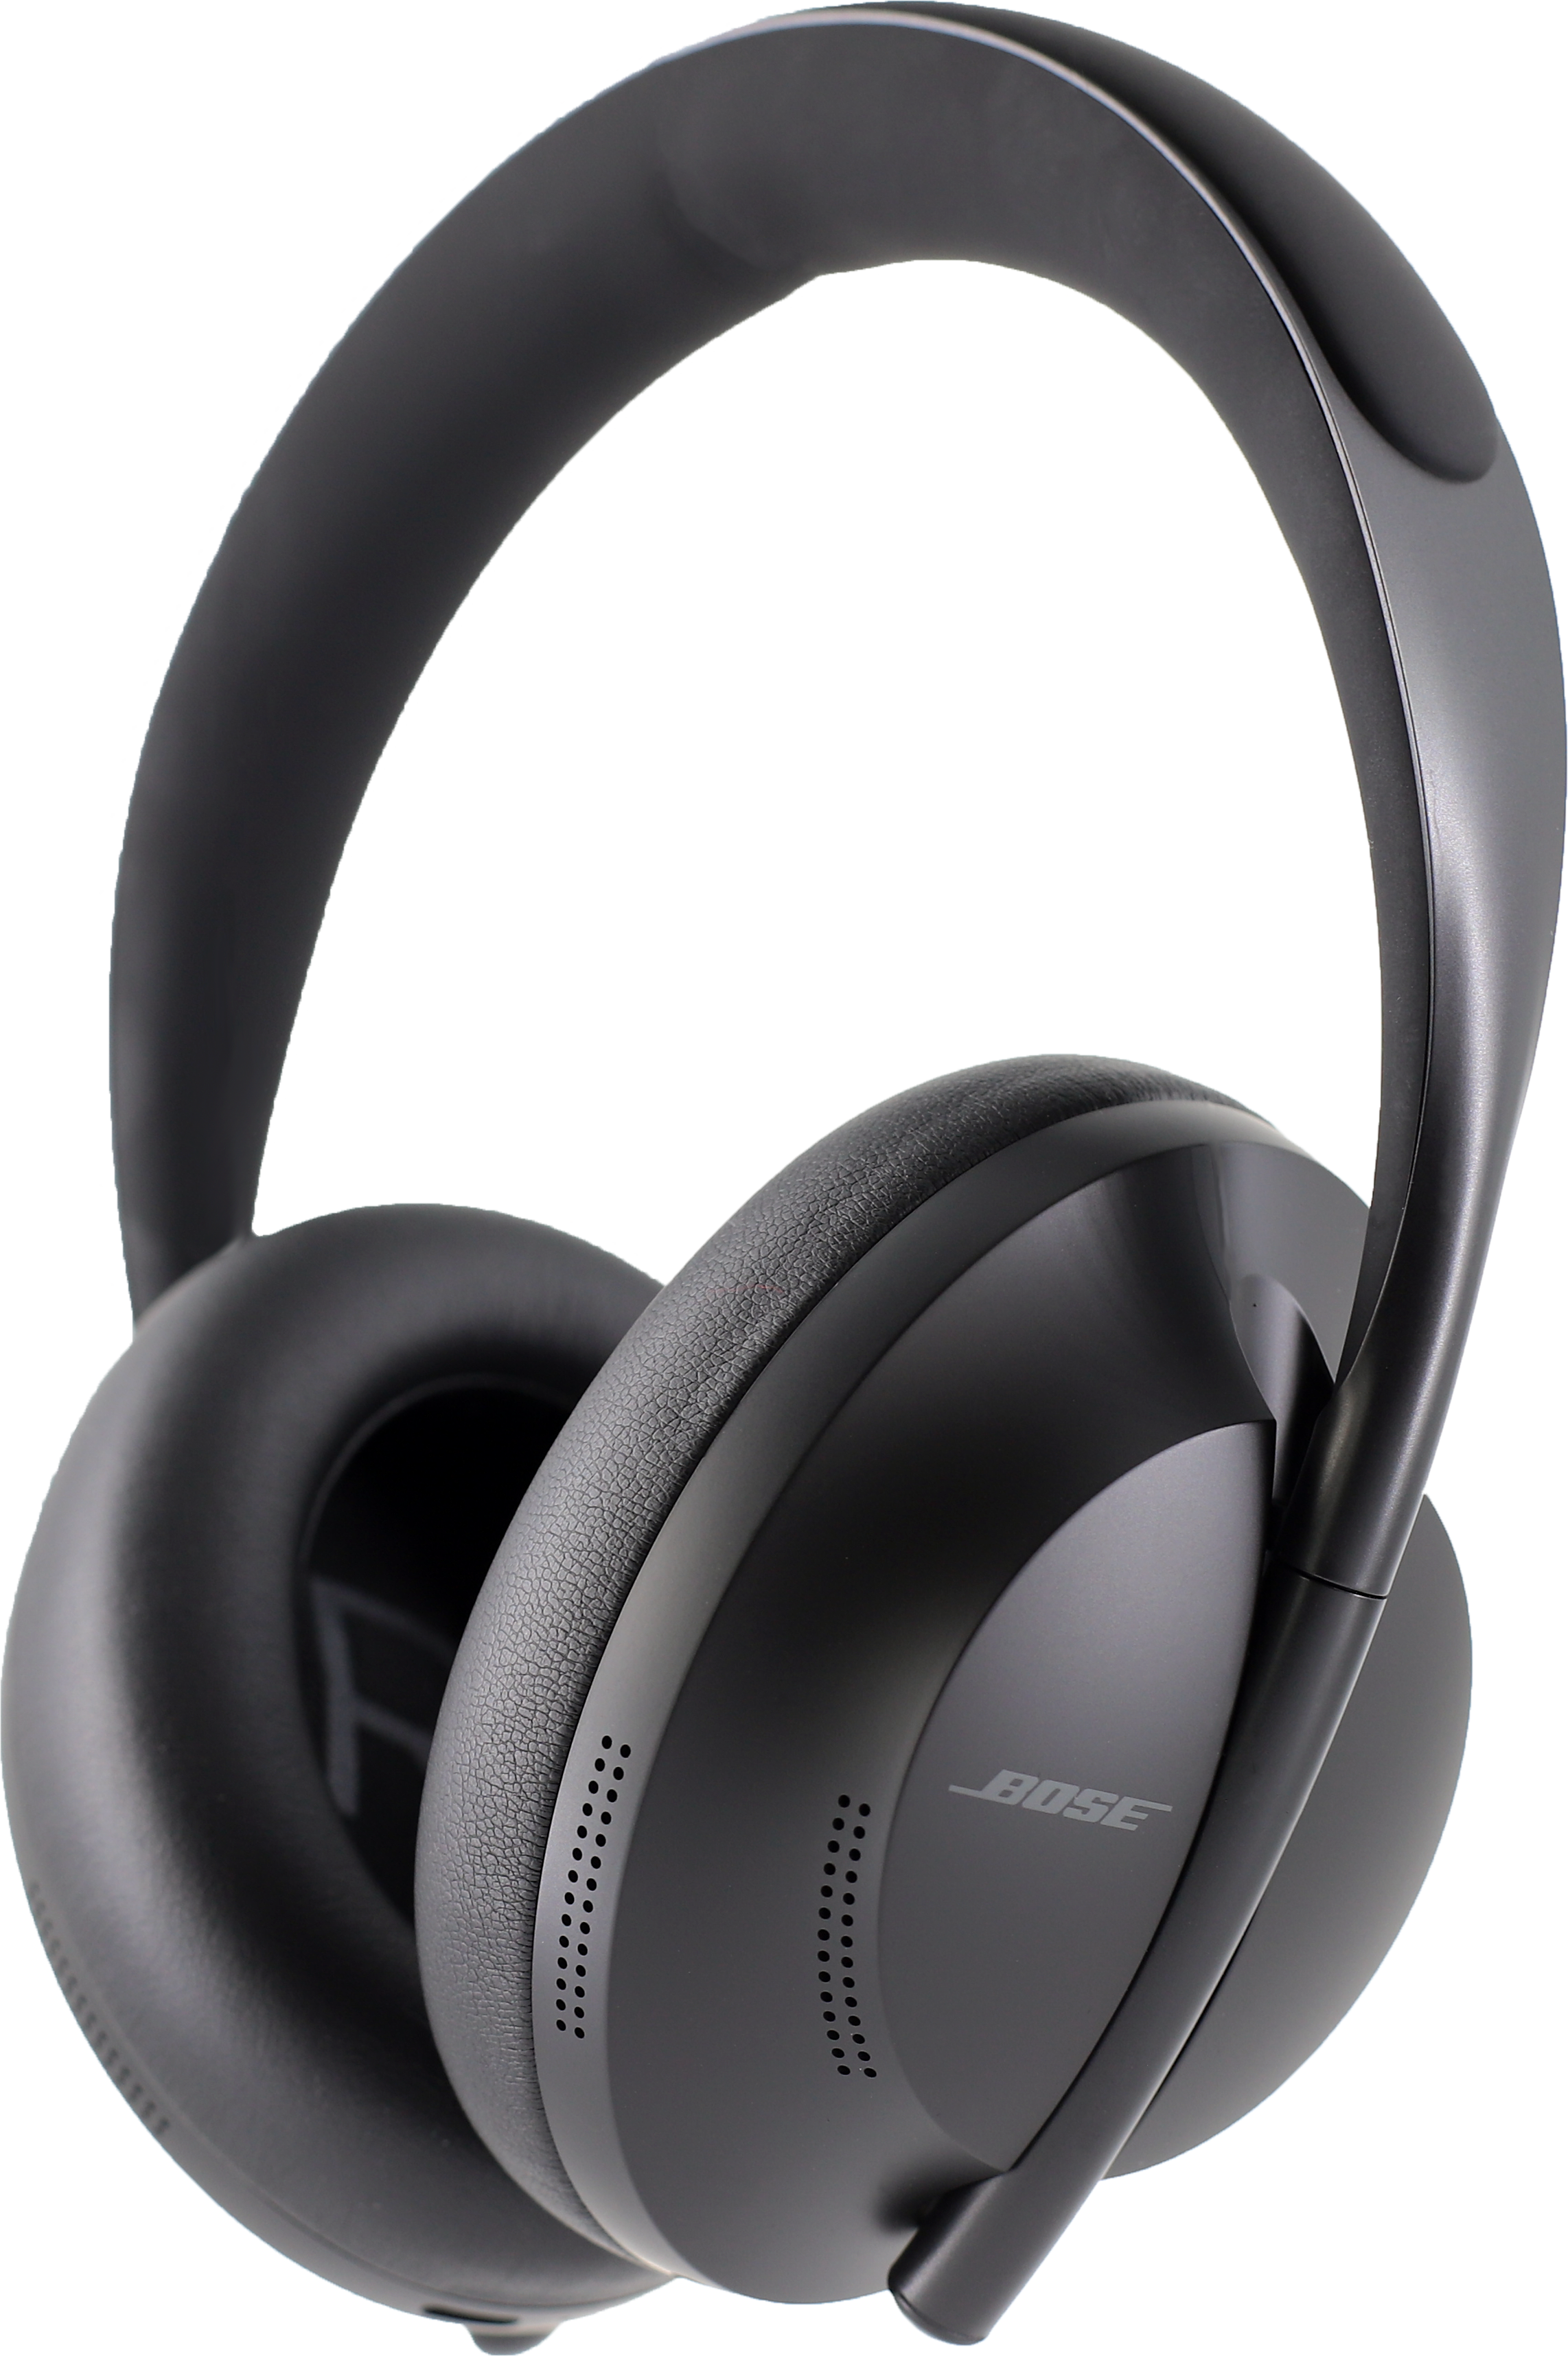 Bose 700 Over-ear Bluetooth Headphones